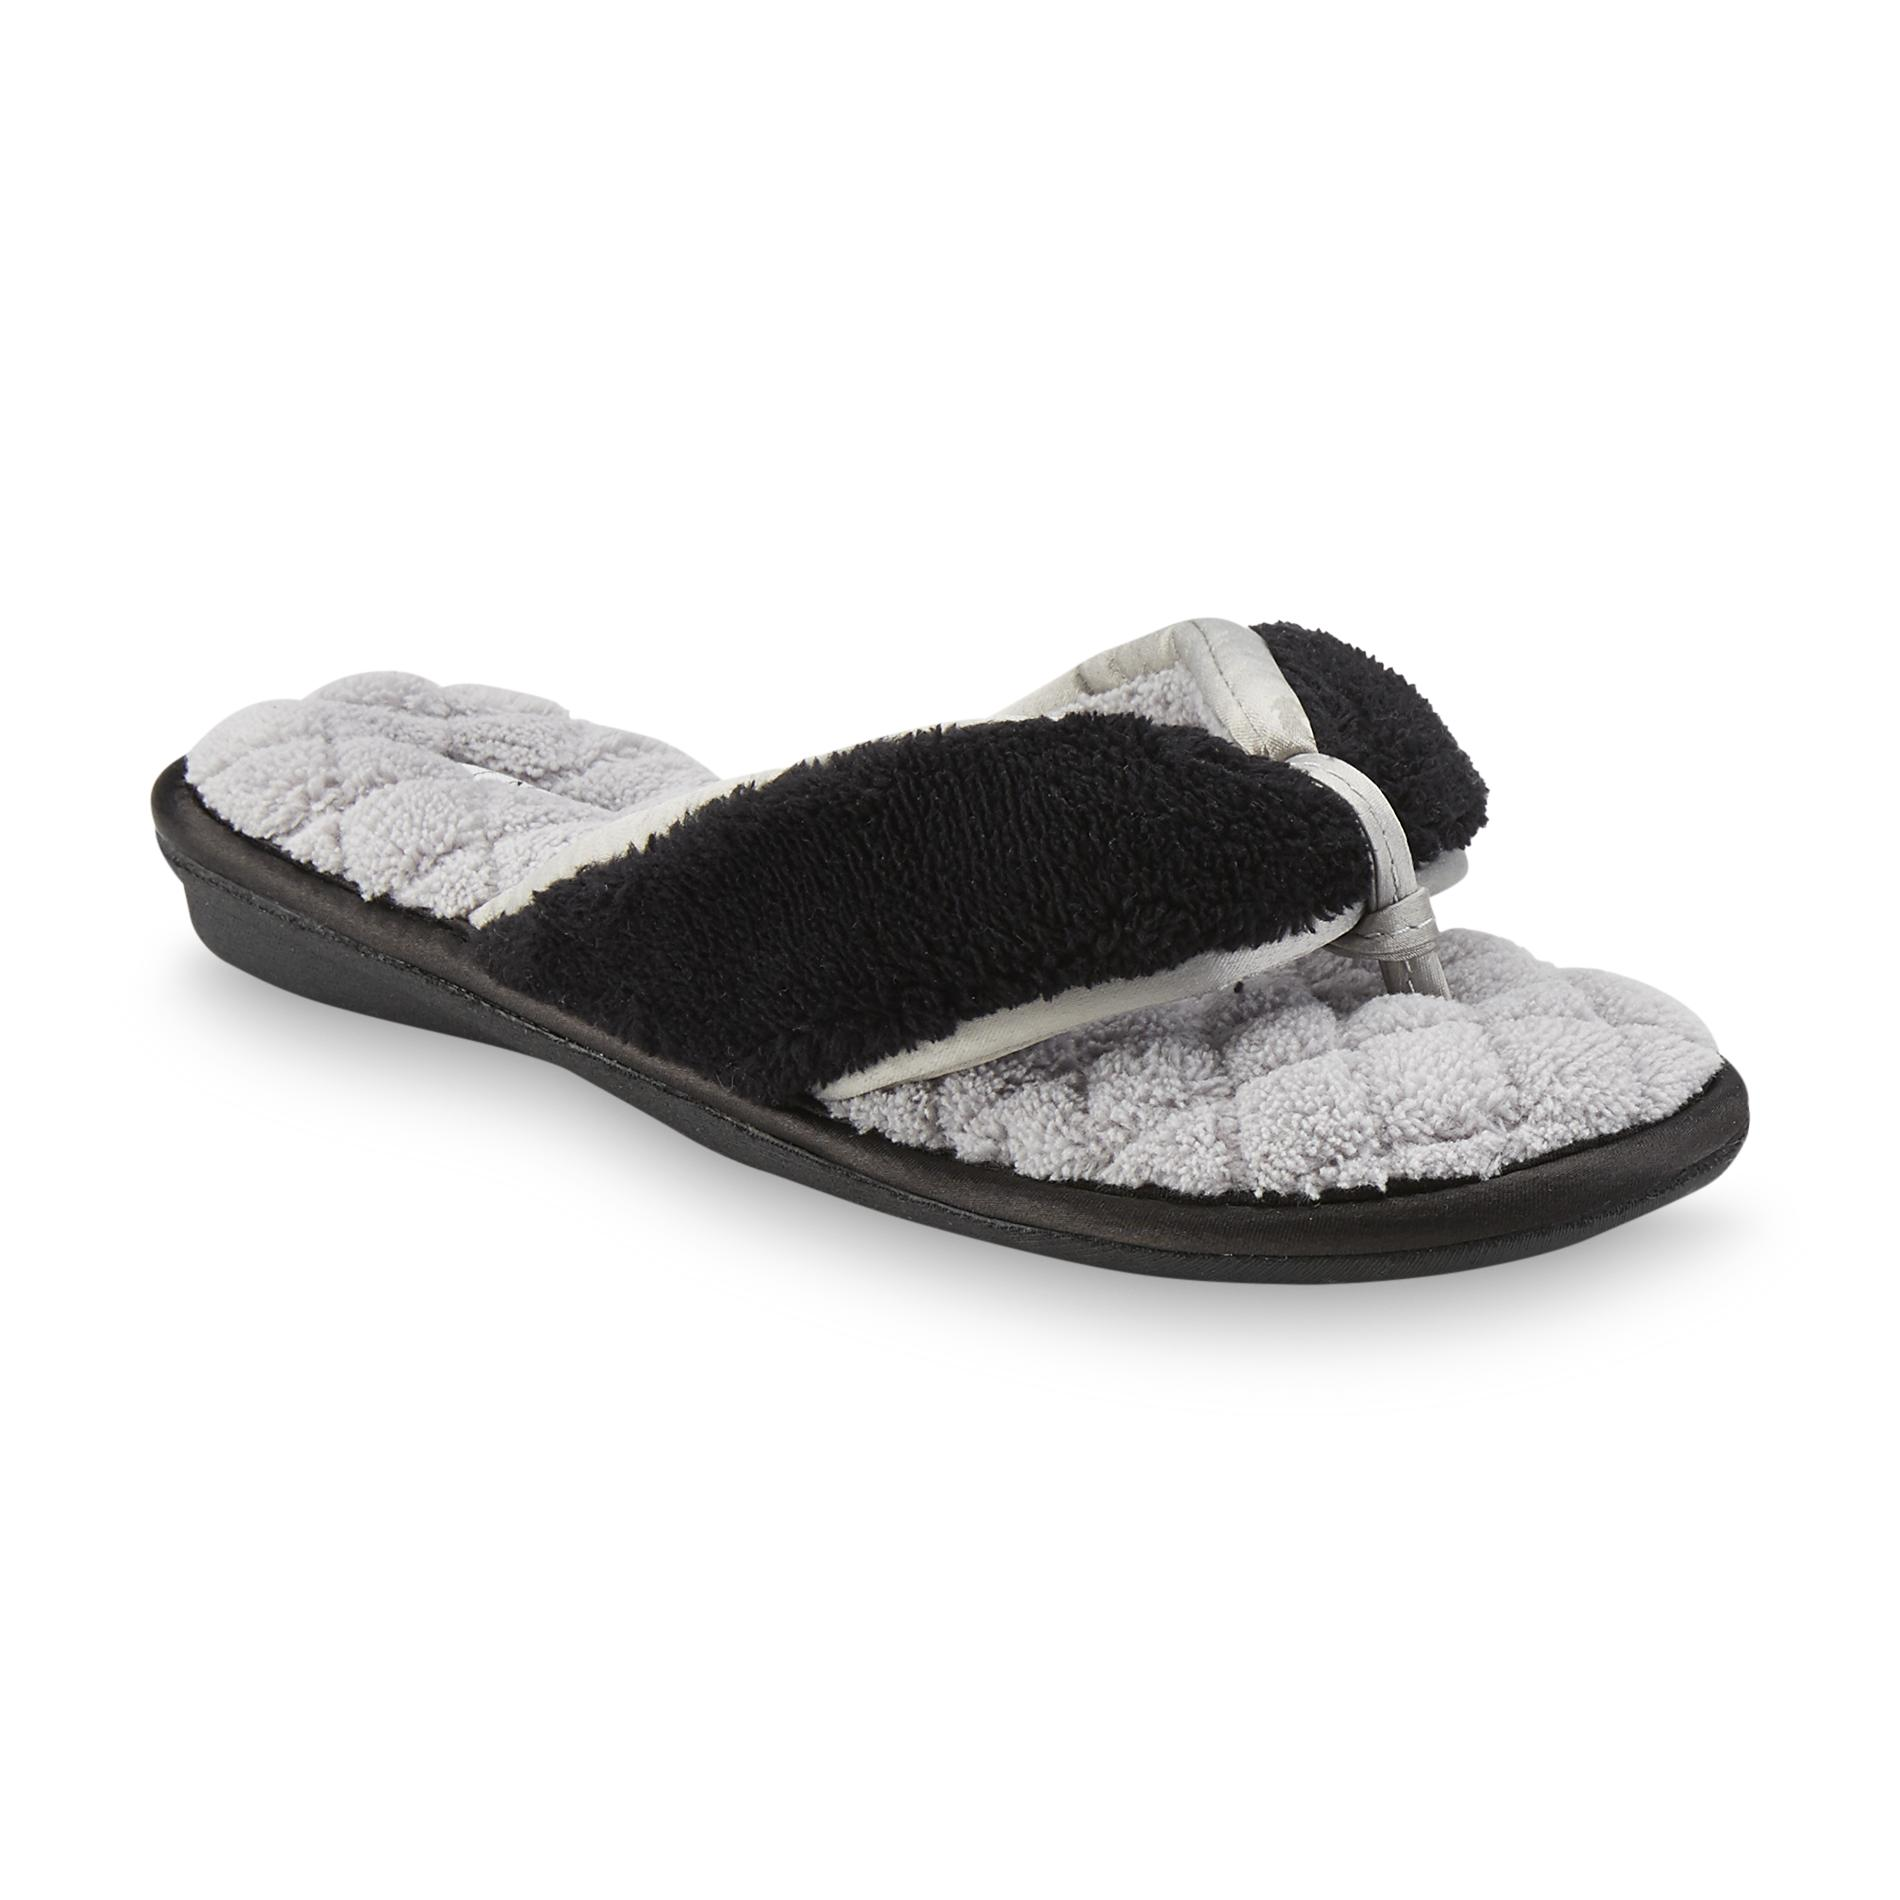 087578e62 Pink K Women s Clarissa Flip-Flop Slipper - Black Gray